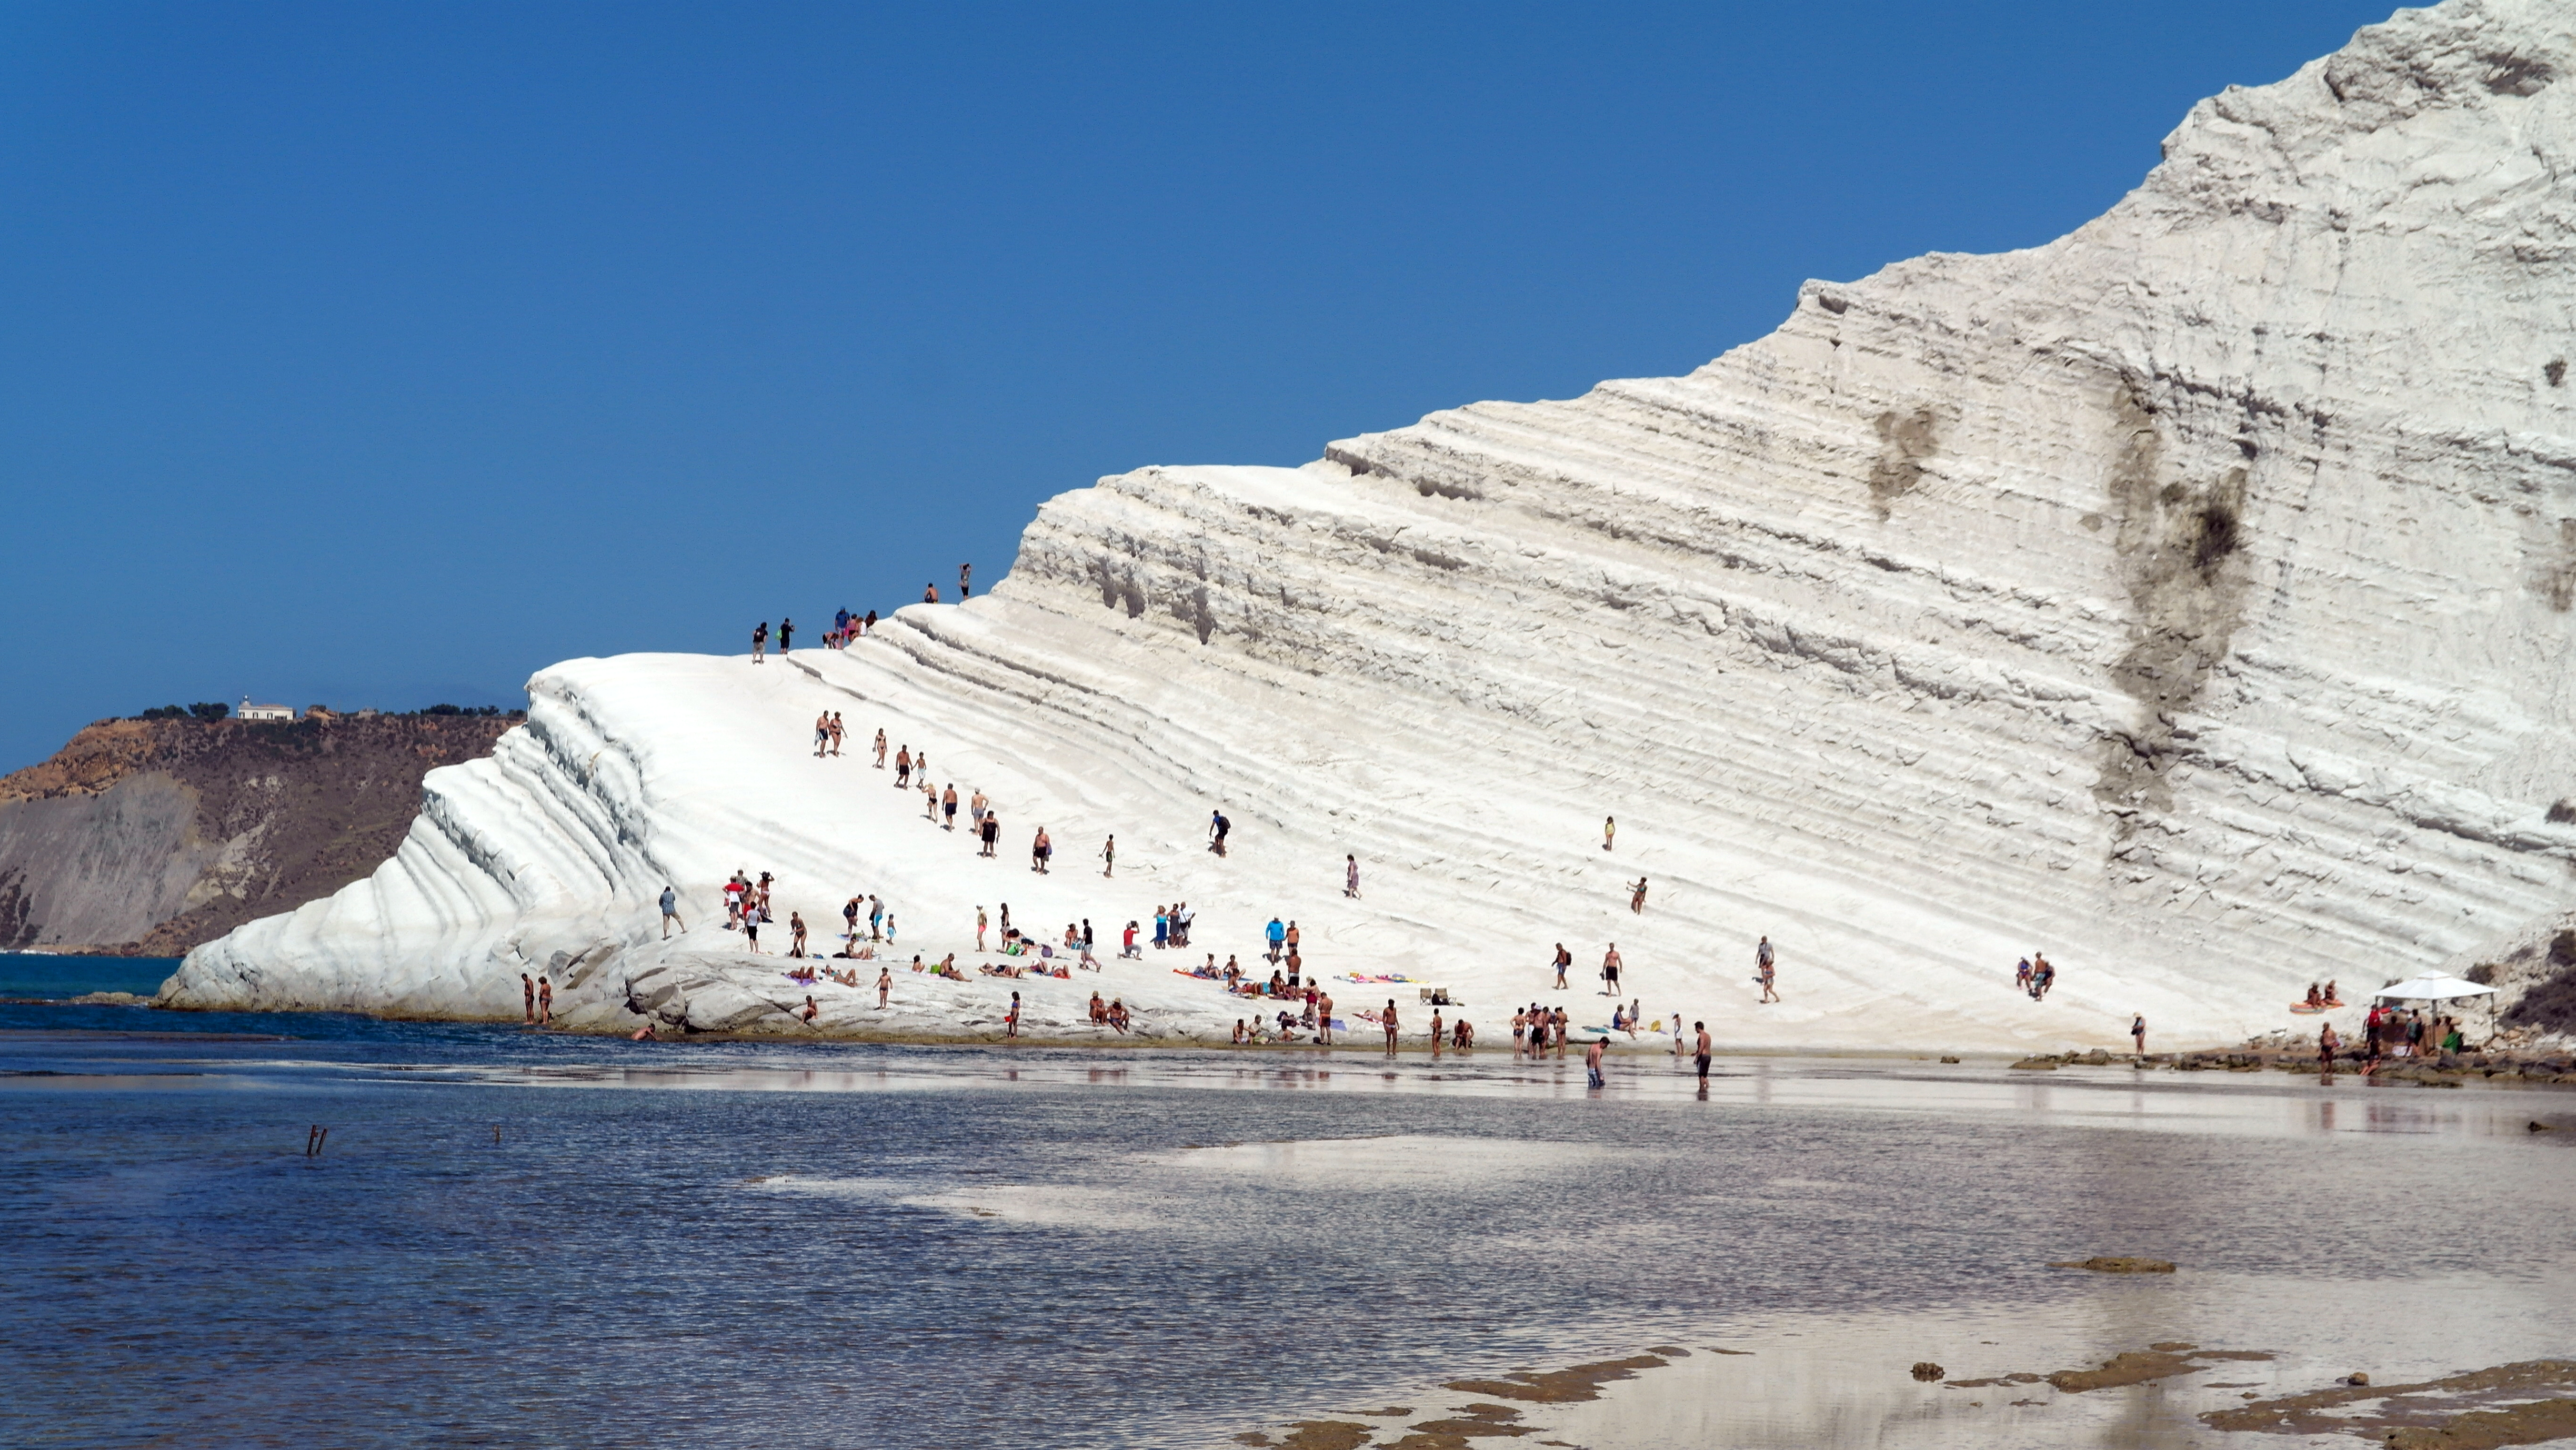 FileScala dei Turchi, Realmonte AG, Sicily, Italy   panoramio 20 ...